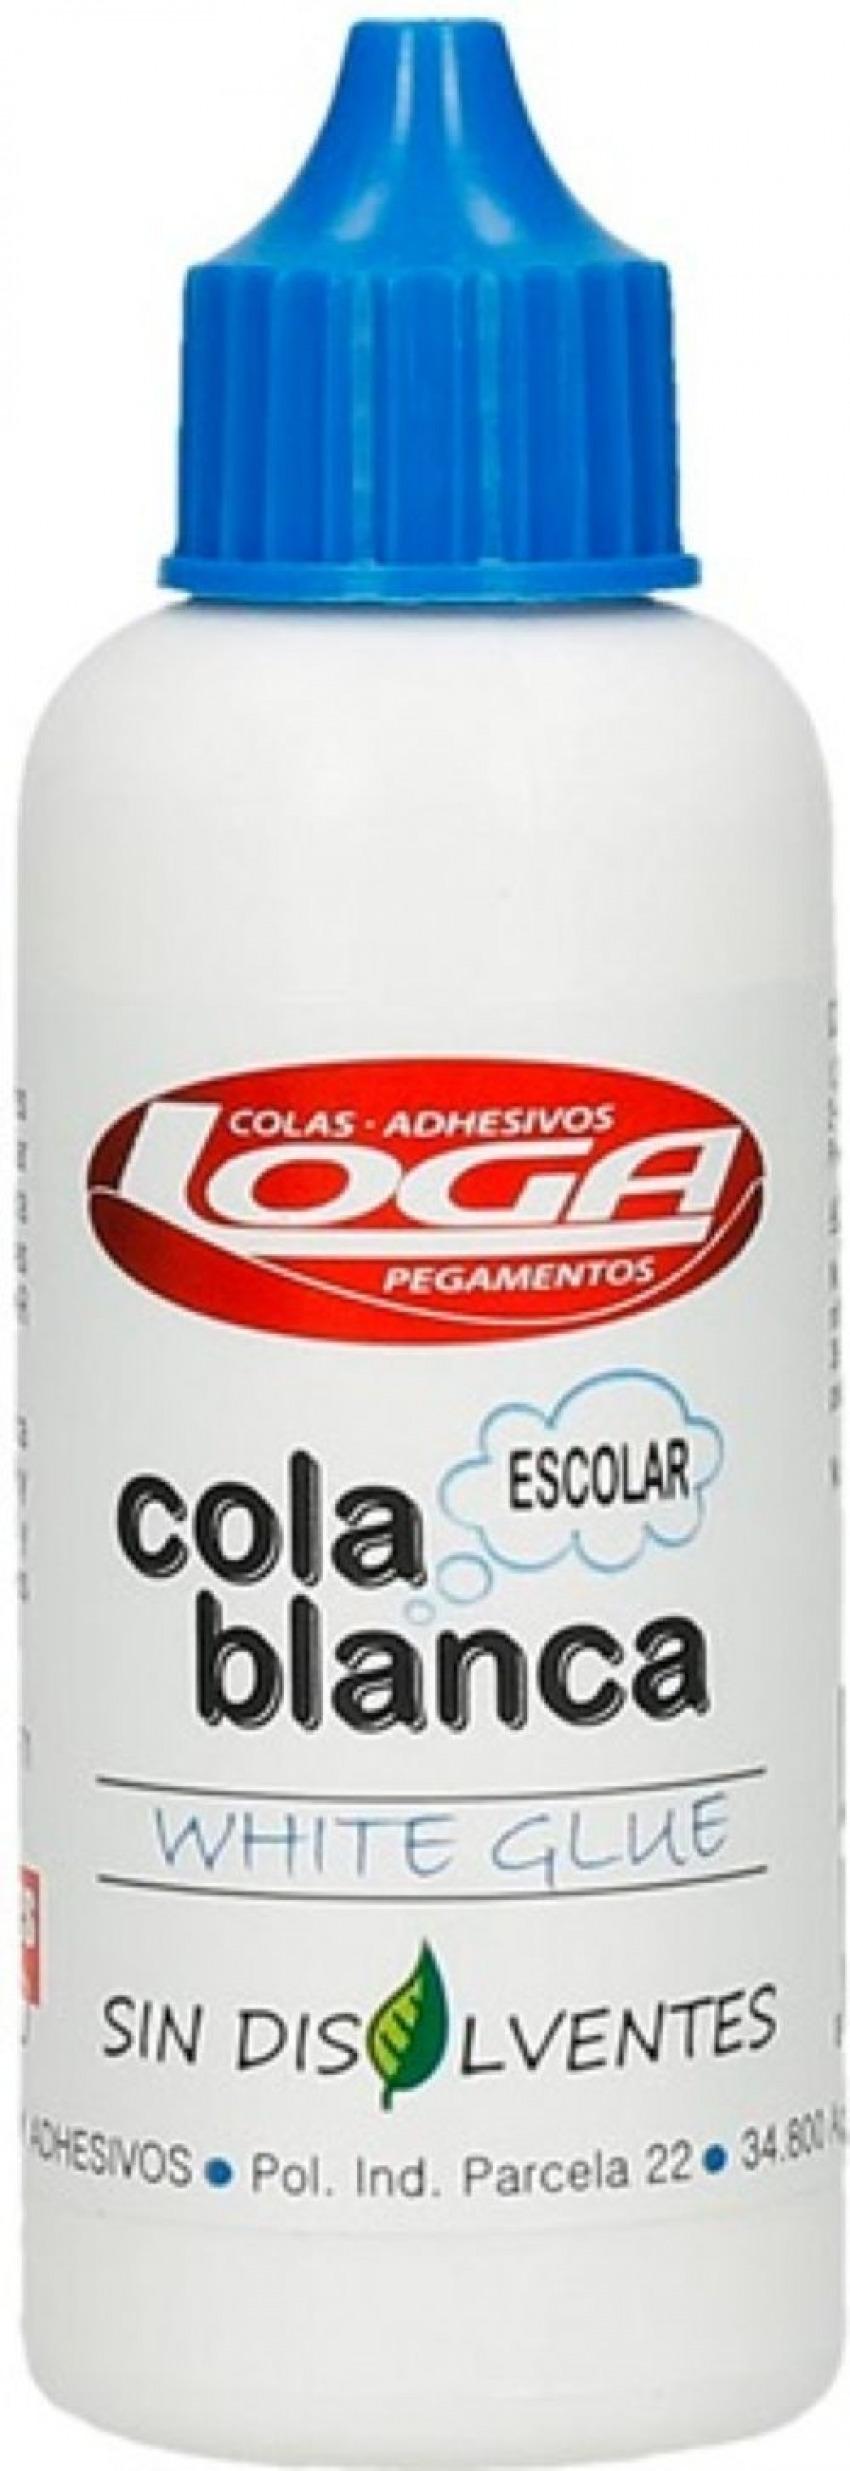 BOTE COLA BLANCA LOGA 70G 8480024003393